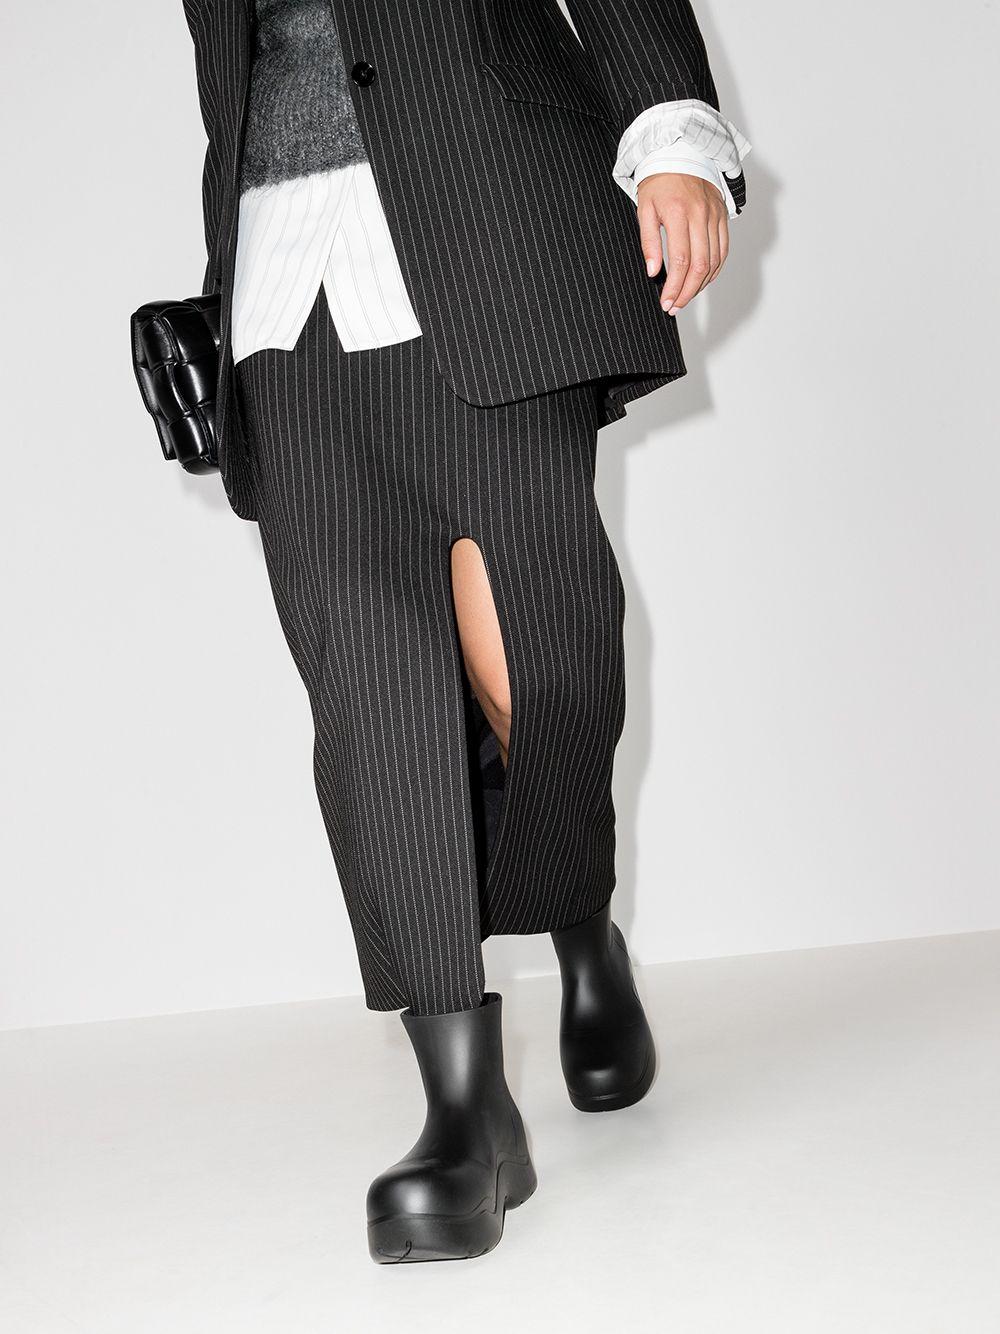 Picture of Bottega Veneta | Puddle Ankle Boots